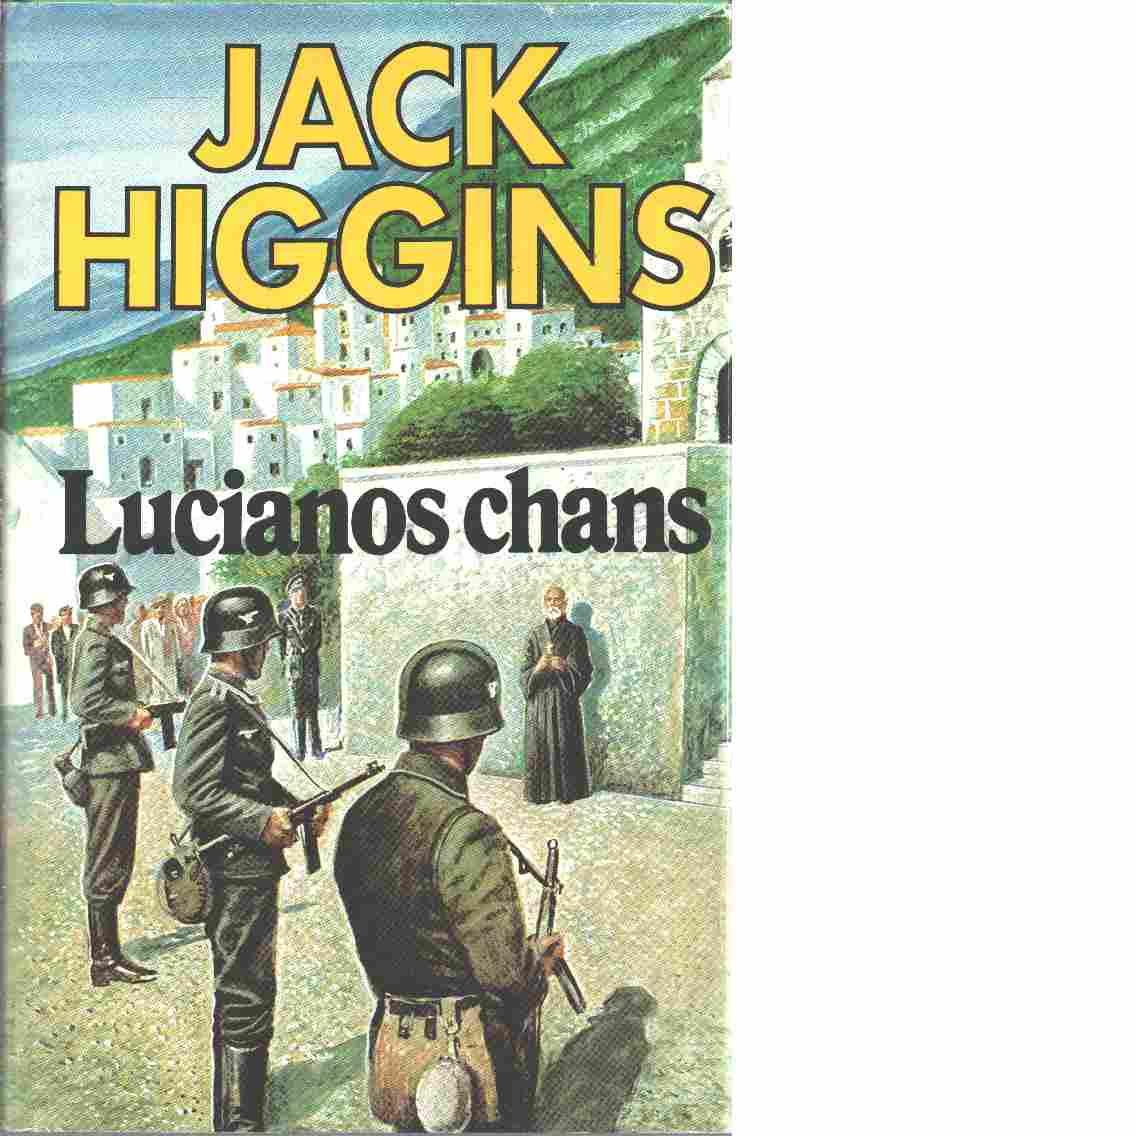 Lucianos chans - Higgins, Jack